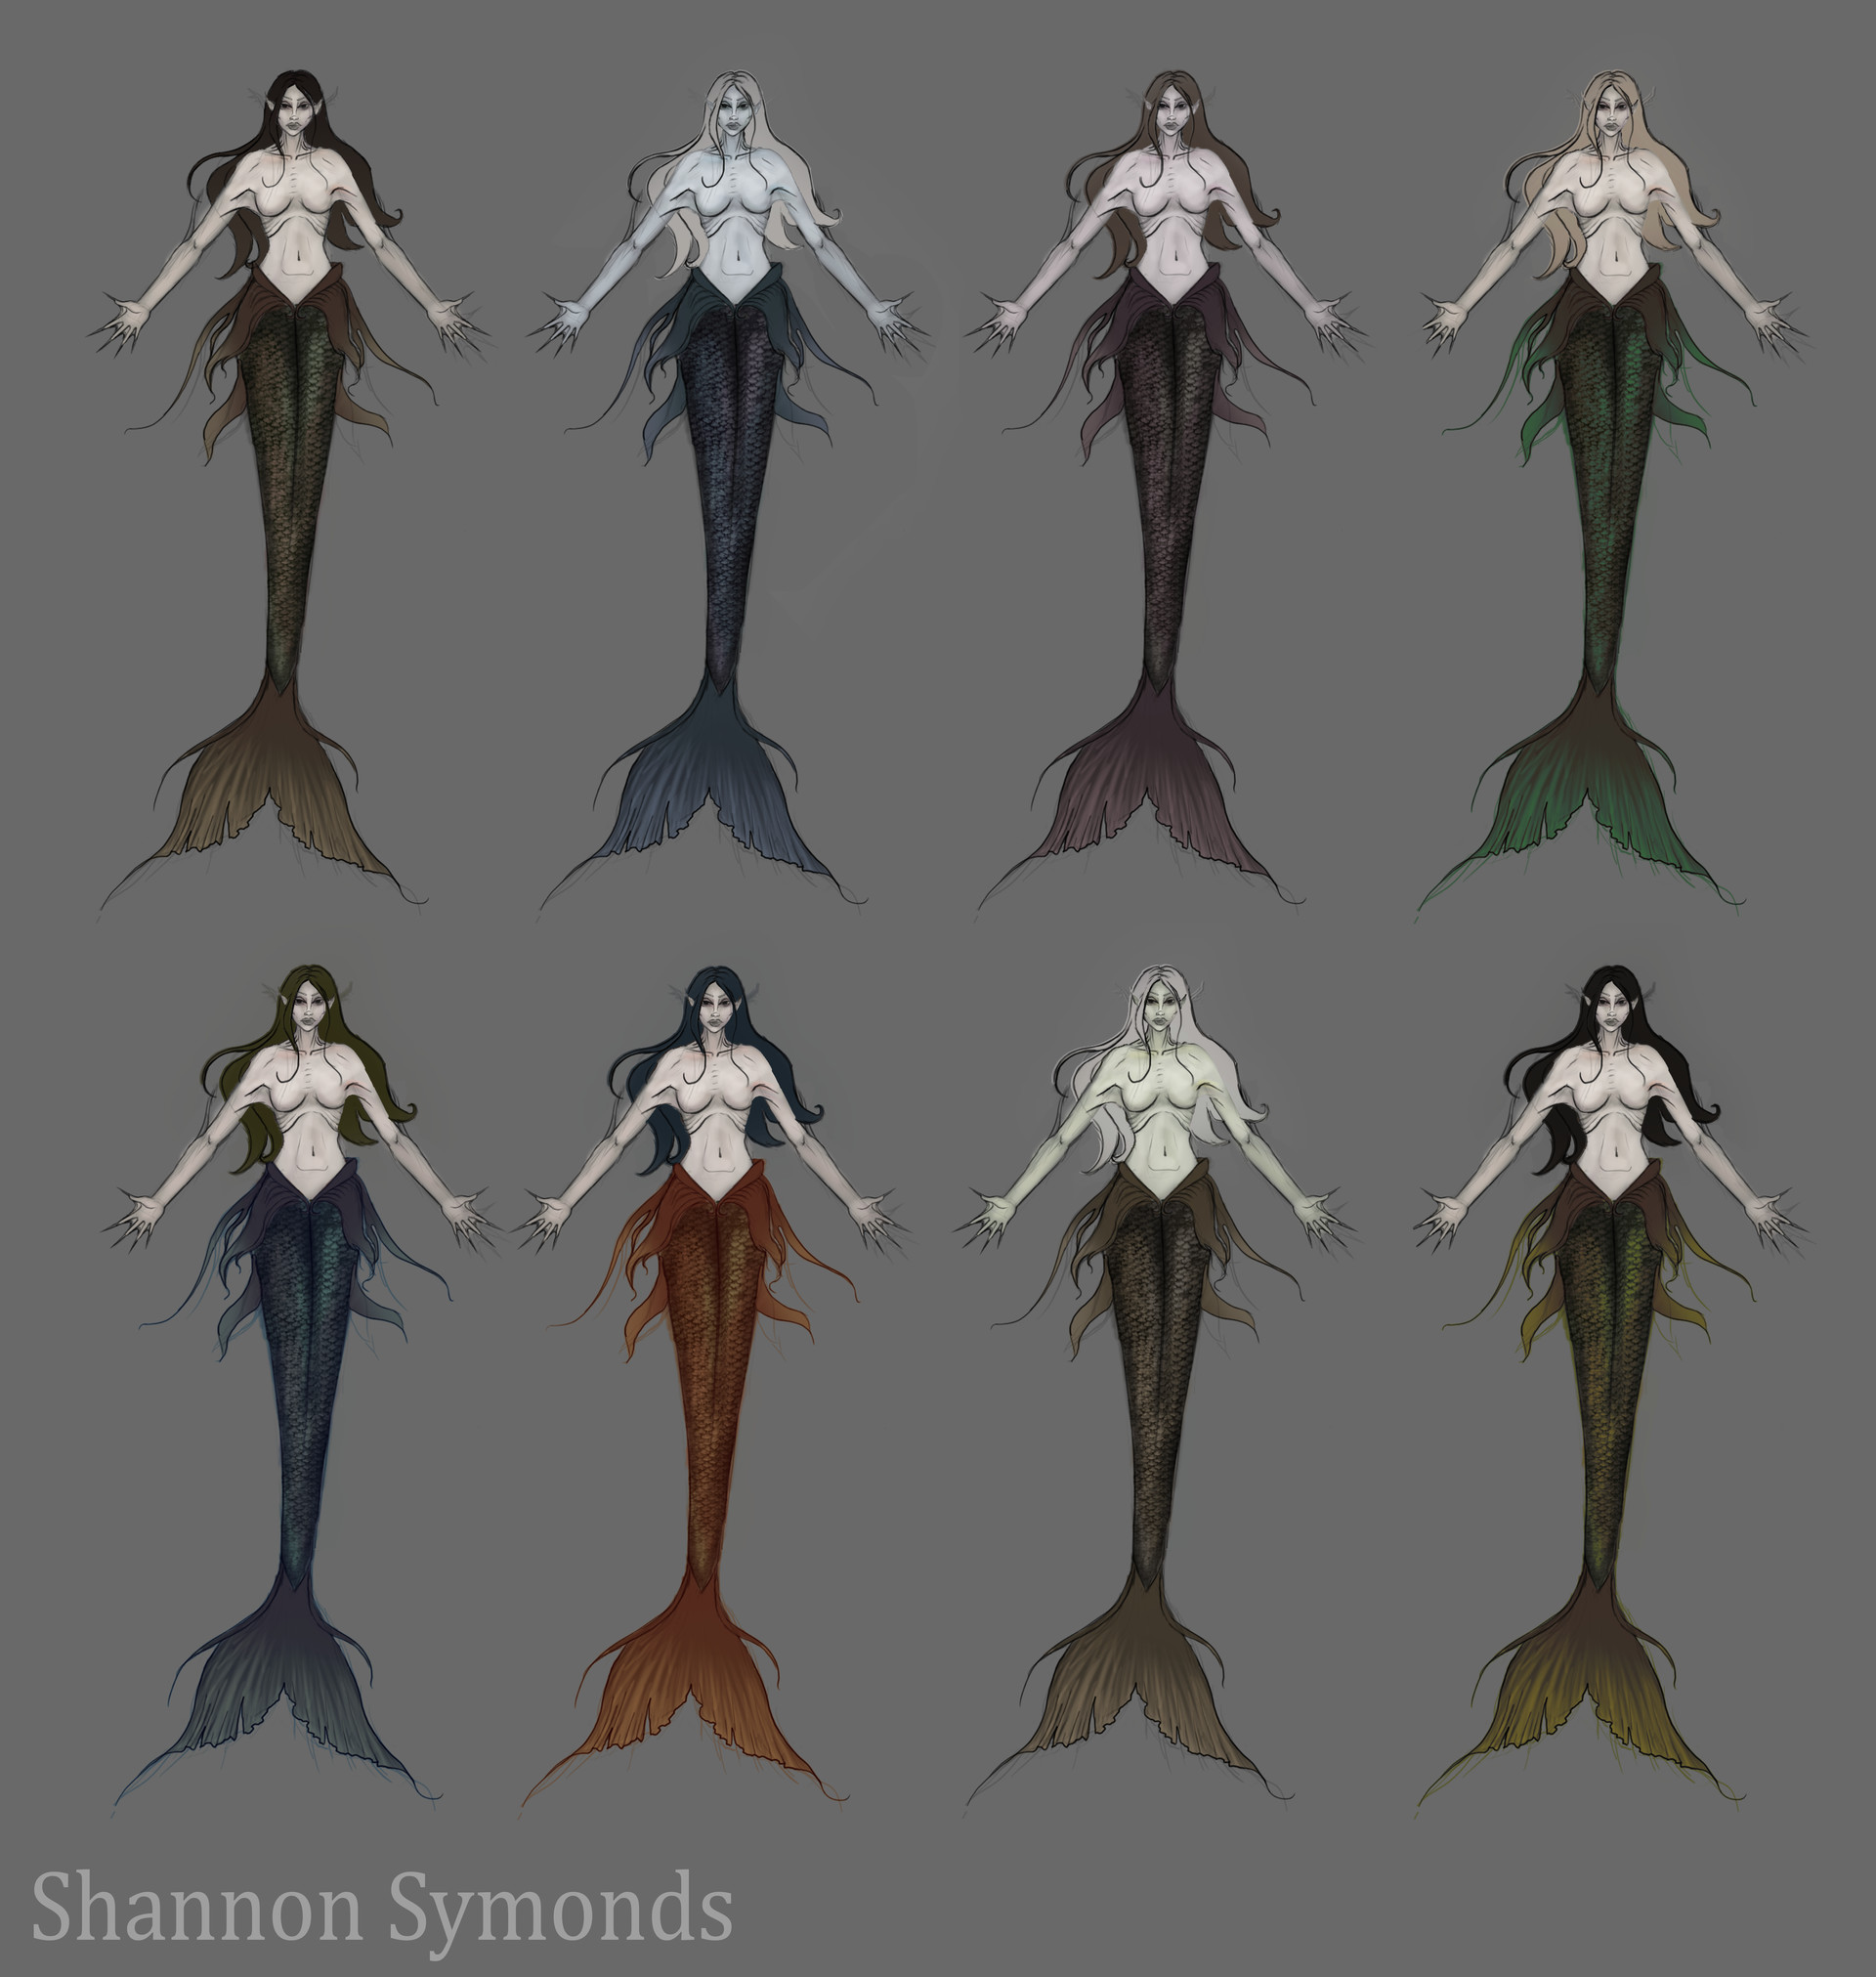 Shannon symonds mermaid colour variations